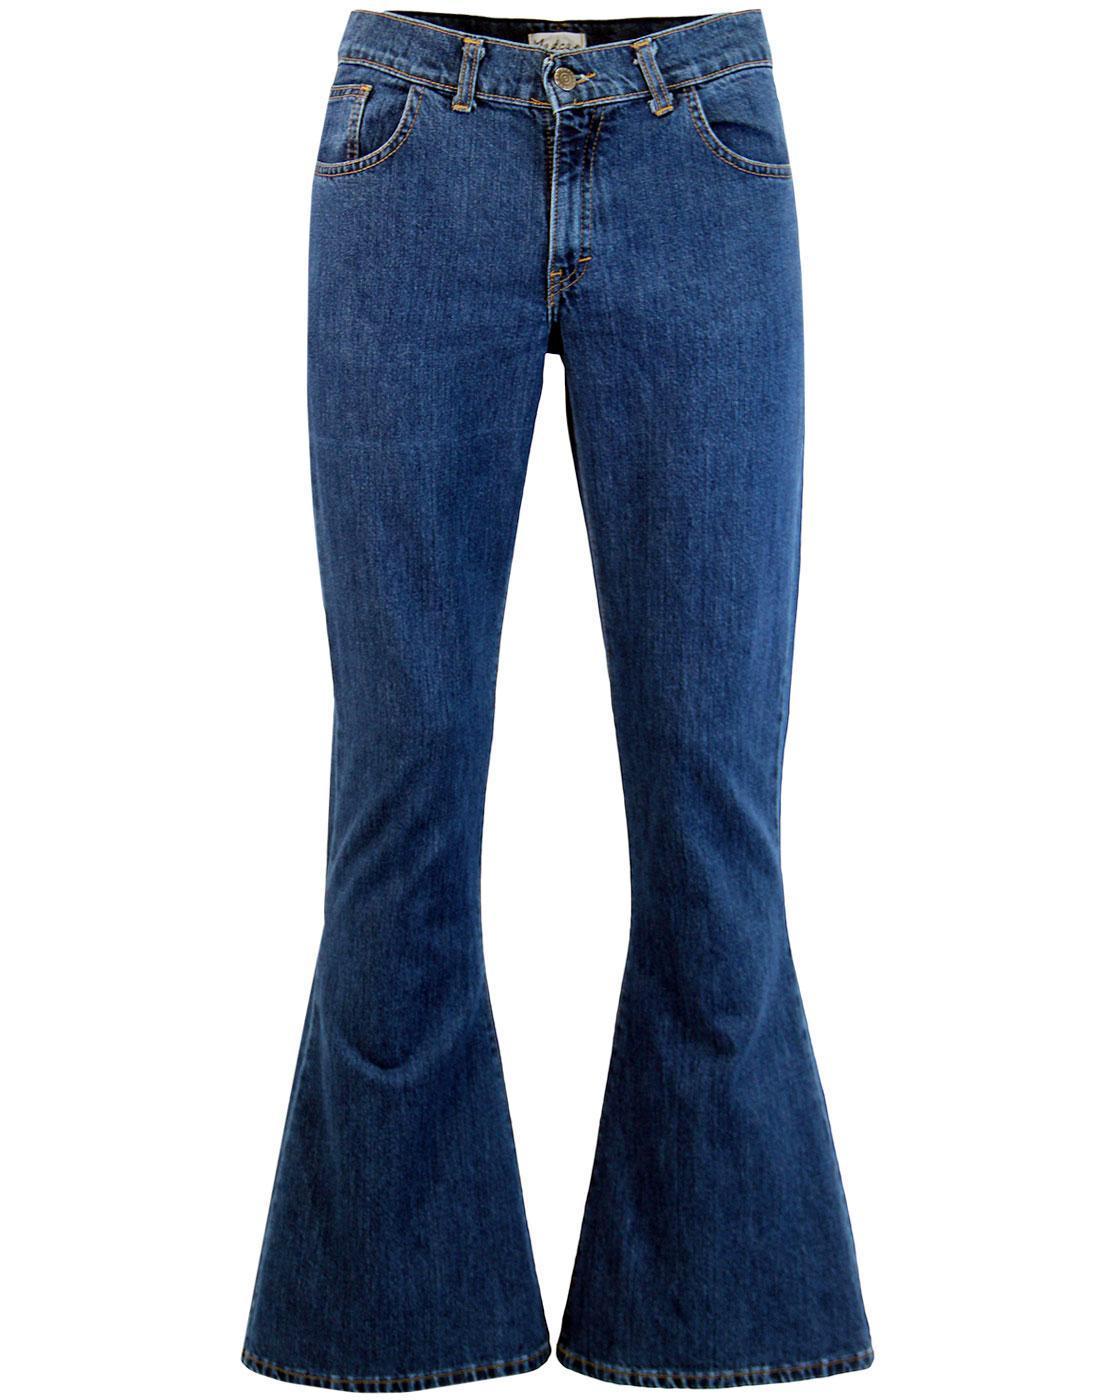 Image result for mens flared jeans